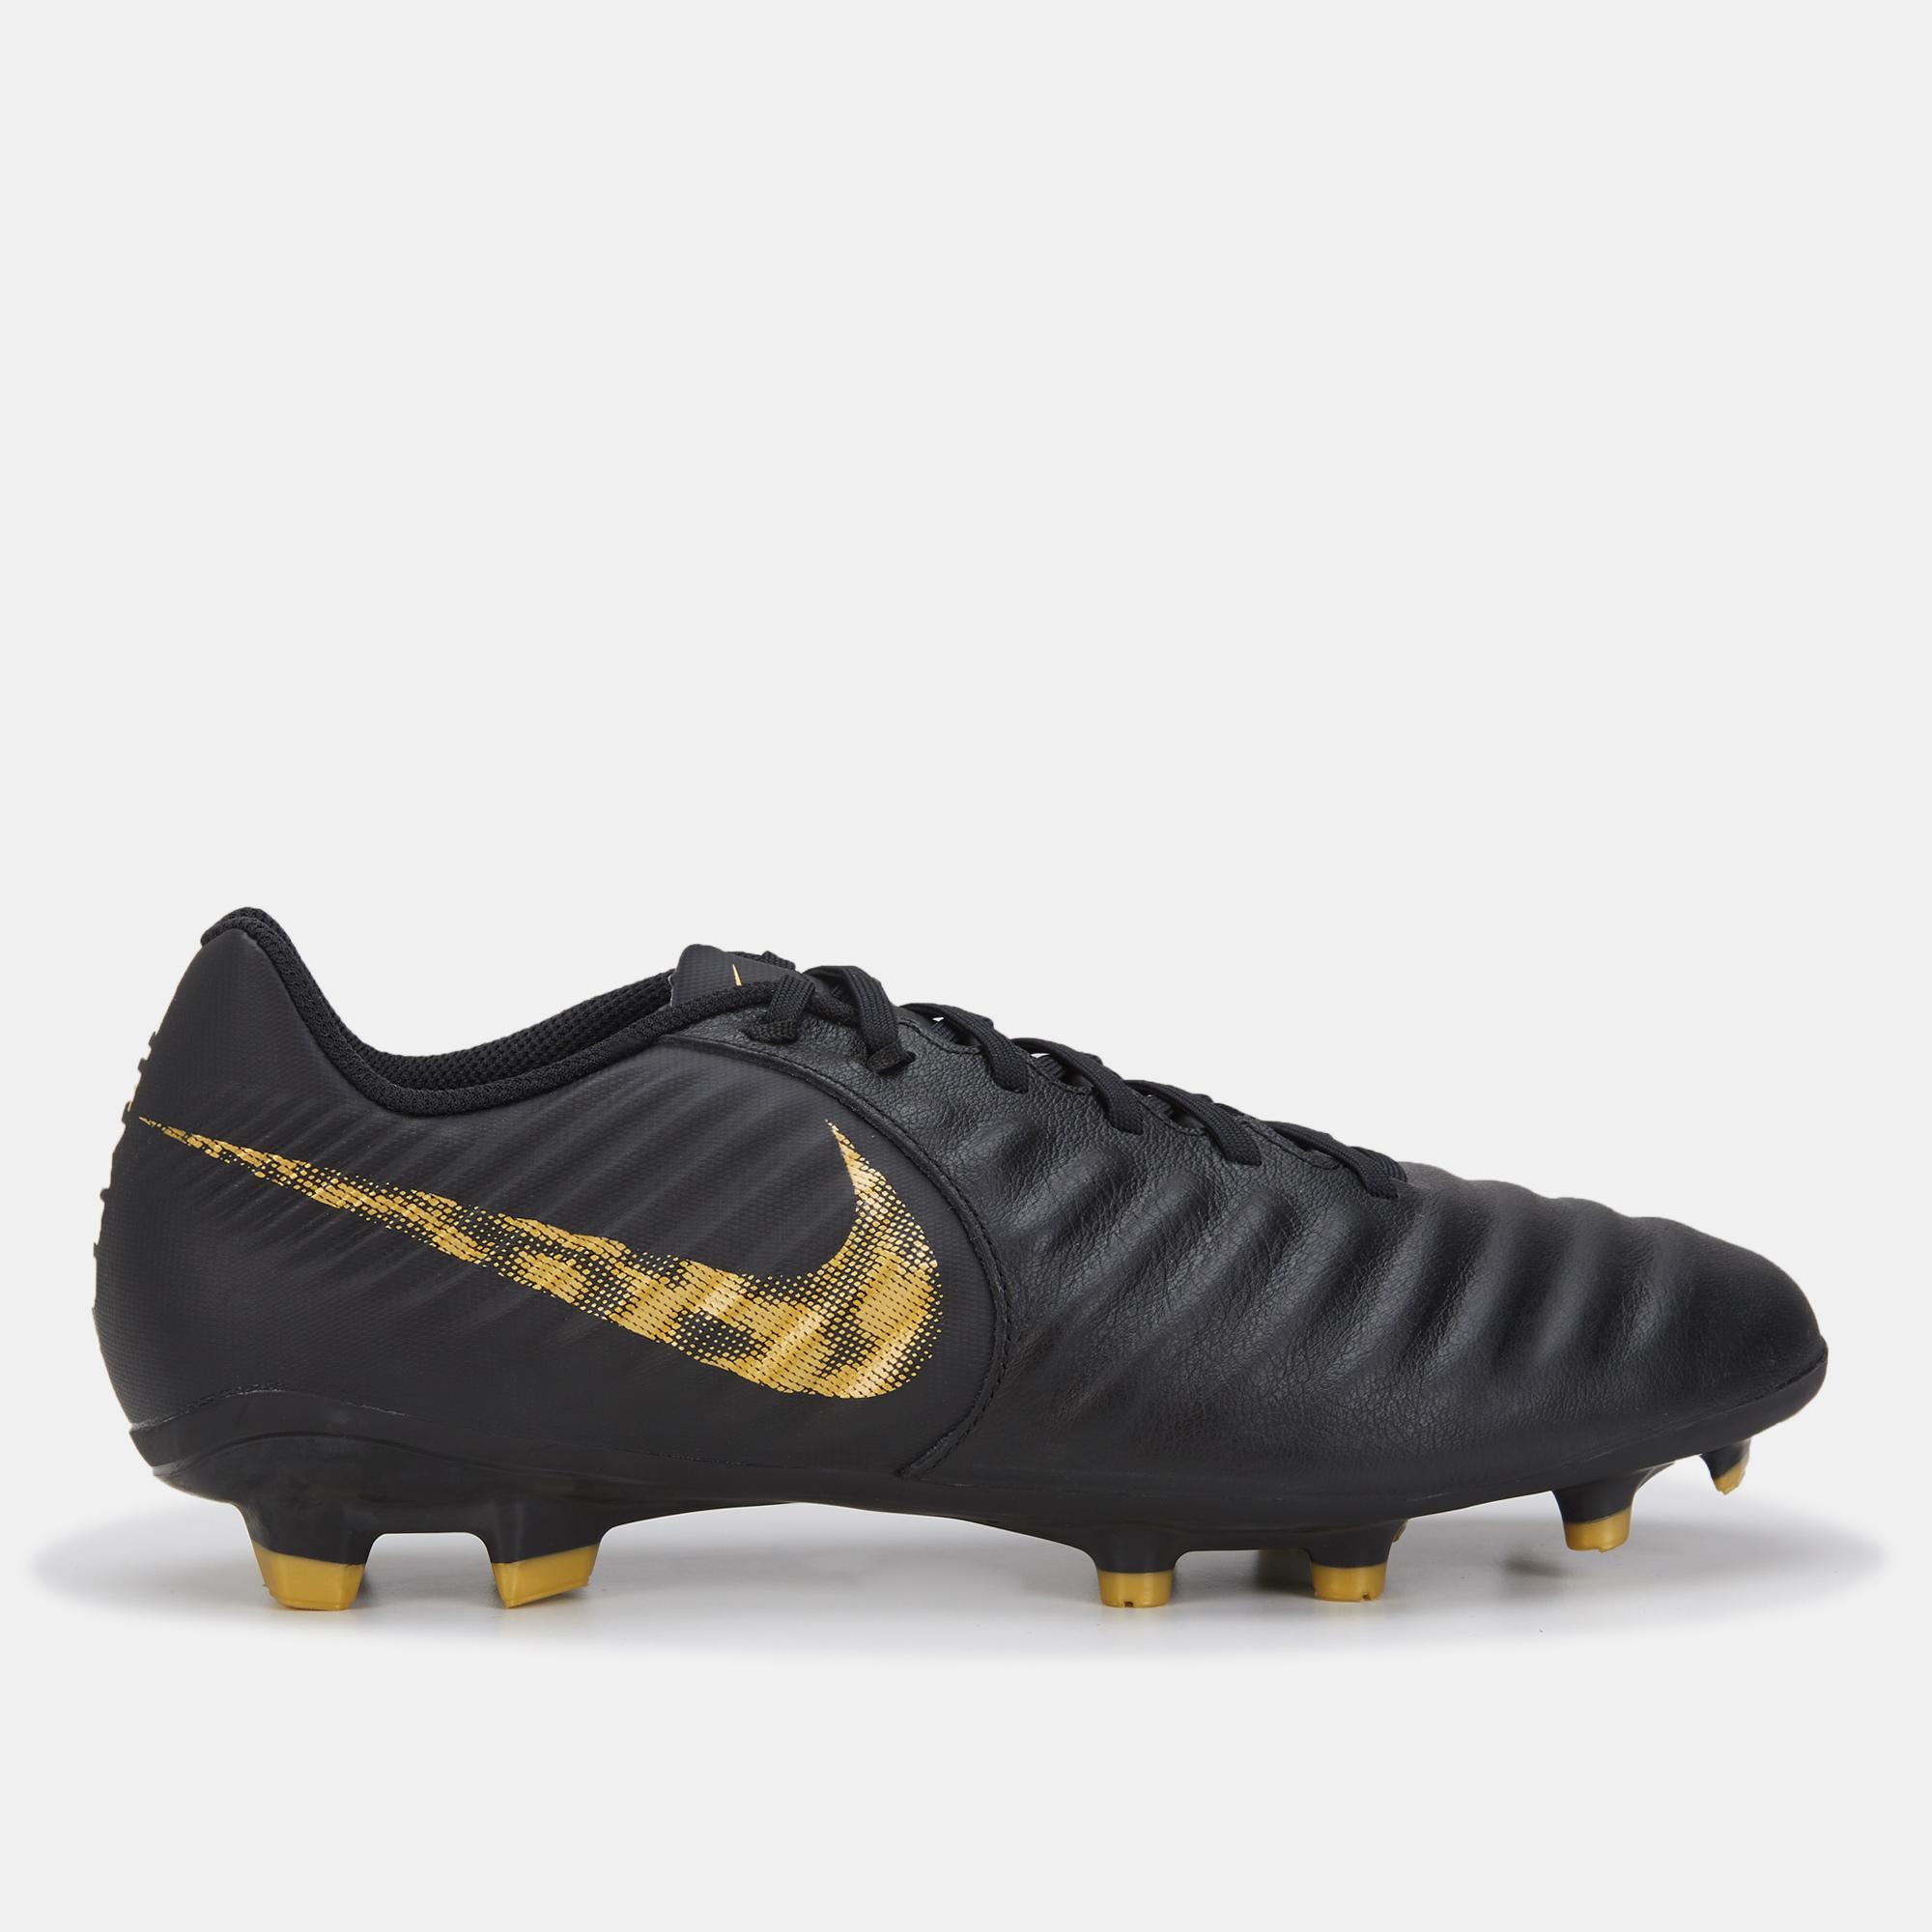 f88a679f6 Nike Men s Tiempo Legend 7 Academy Firm Ground Football Shoe